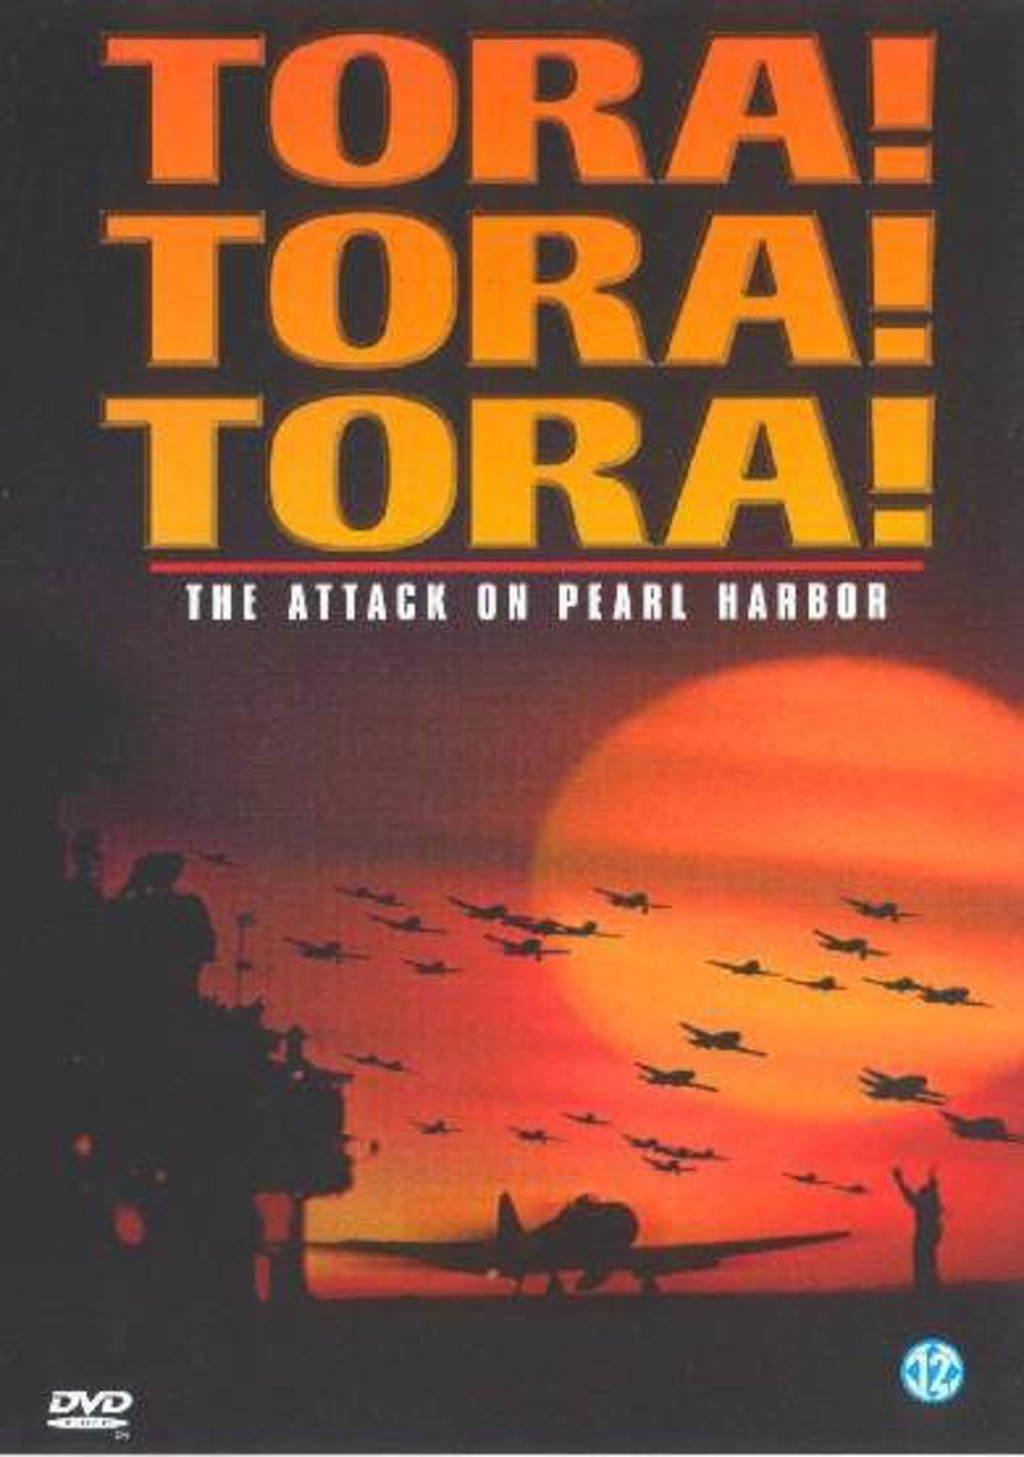 Tora, tora, tora (DVD)